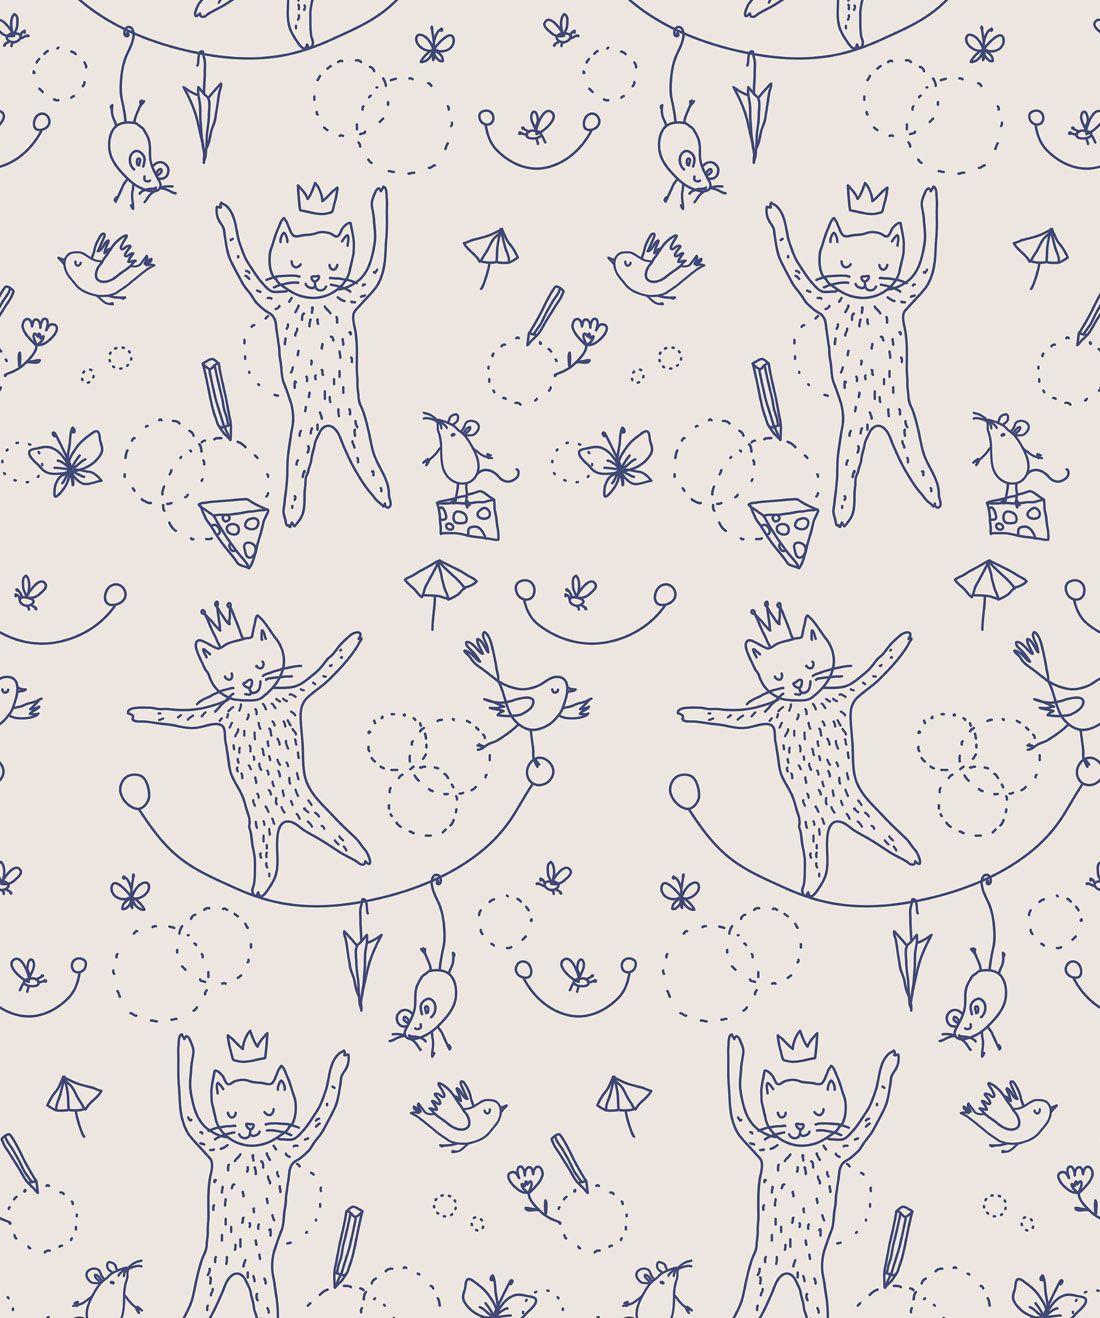 Mice & Cats Wallpaper